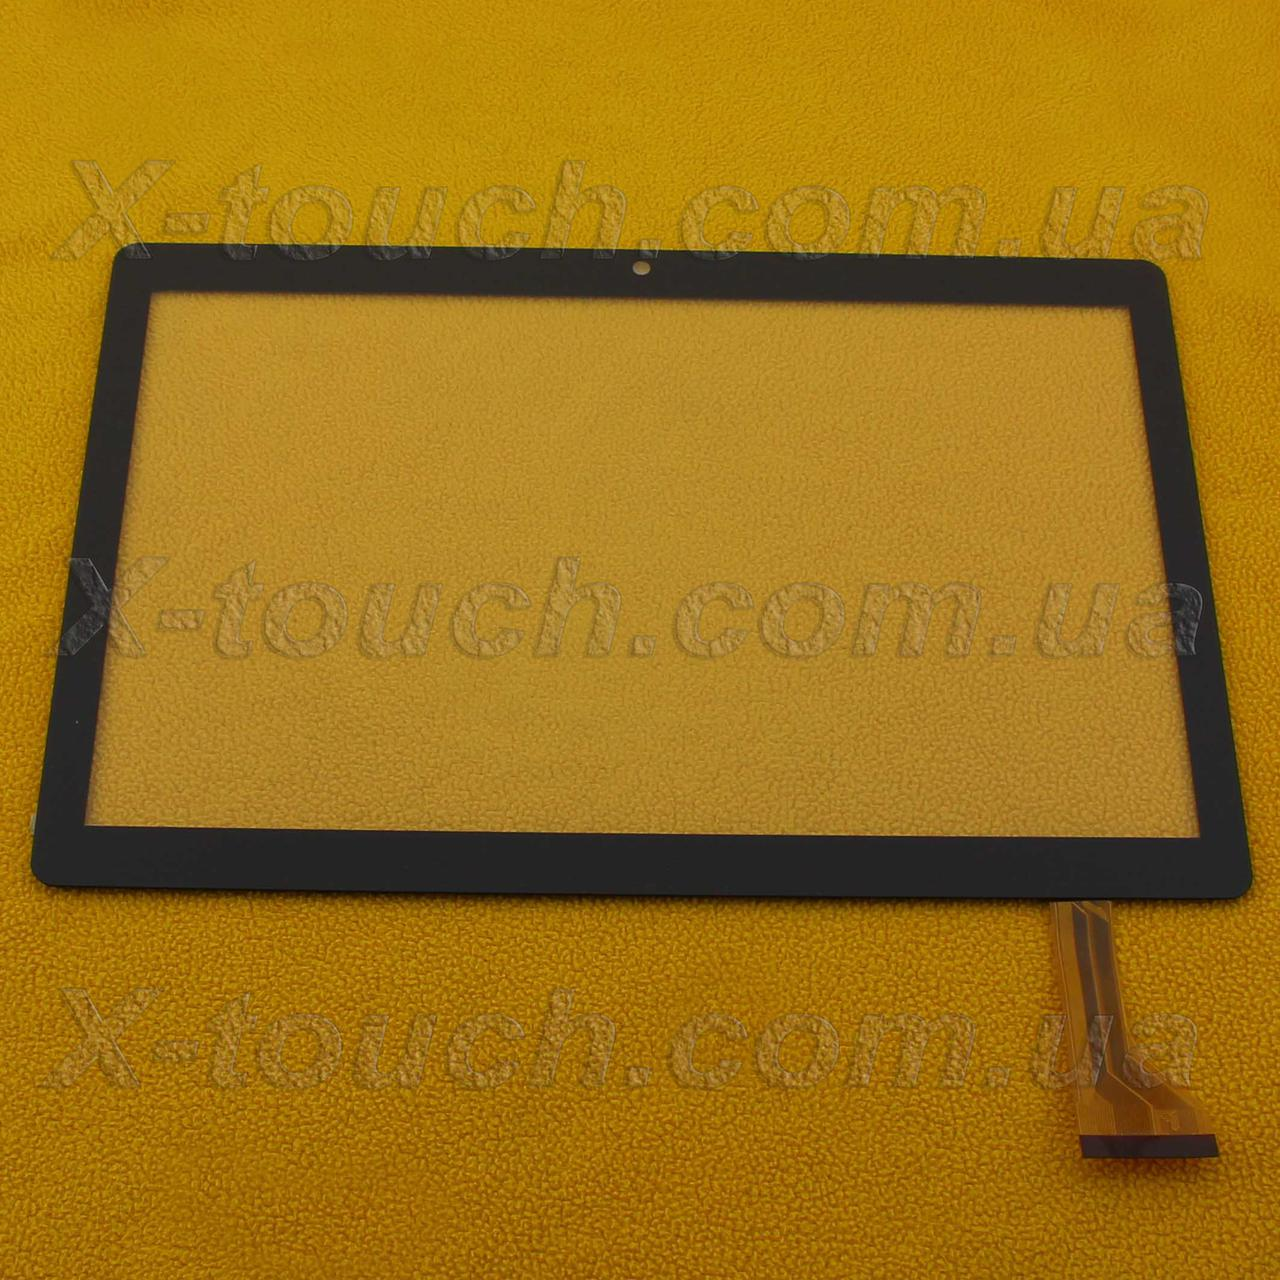 Cенсор, тачскрин Sunstech TAB2323GMQC, цвет черный.